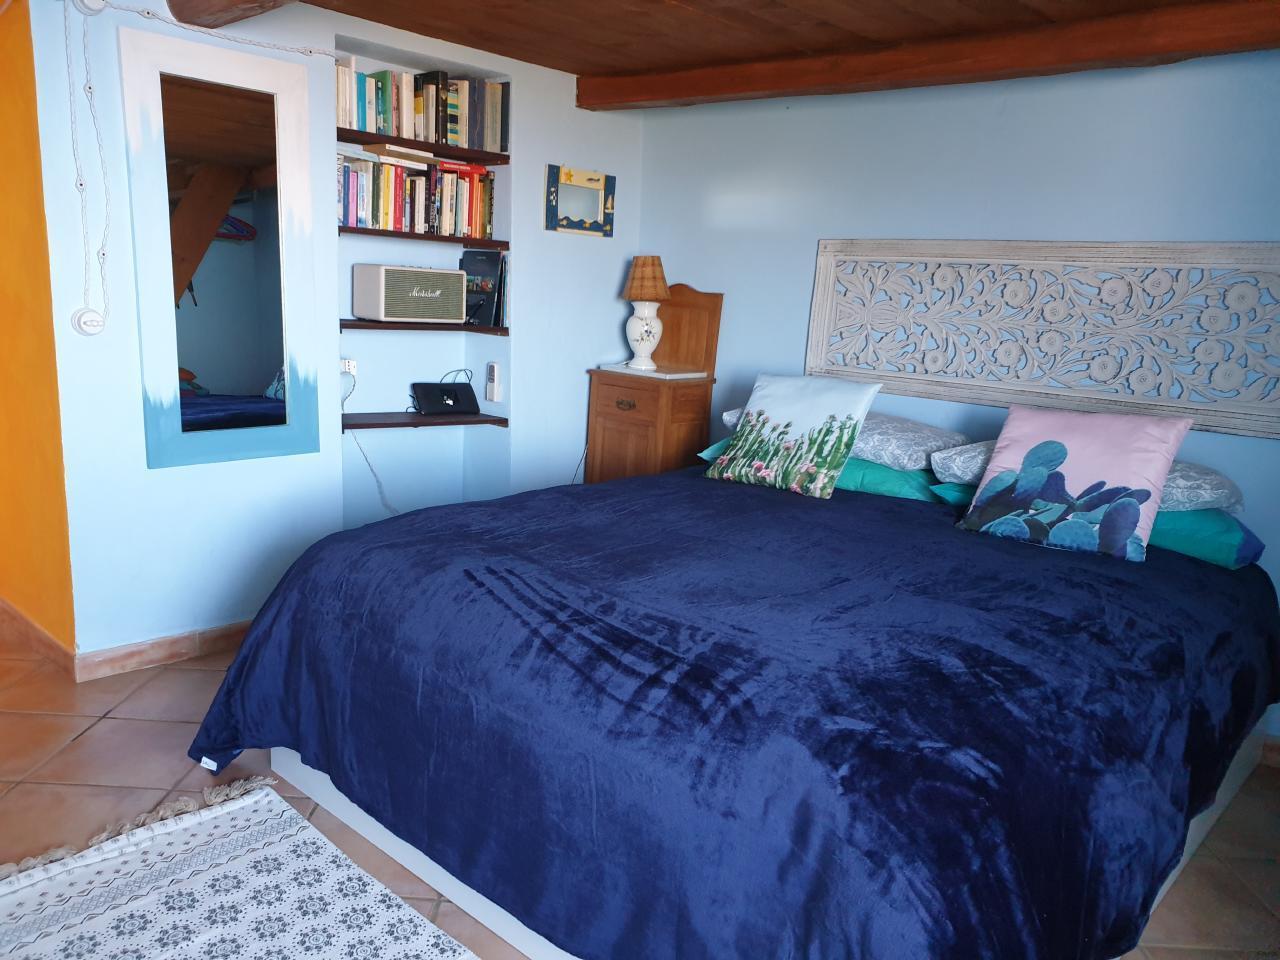 Maison de vacances Casetta Eoliana Lipari Inseln, pool, sauna. (827872), Lipari, Lipari, Sicile, Italie, image 17